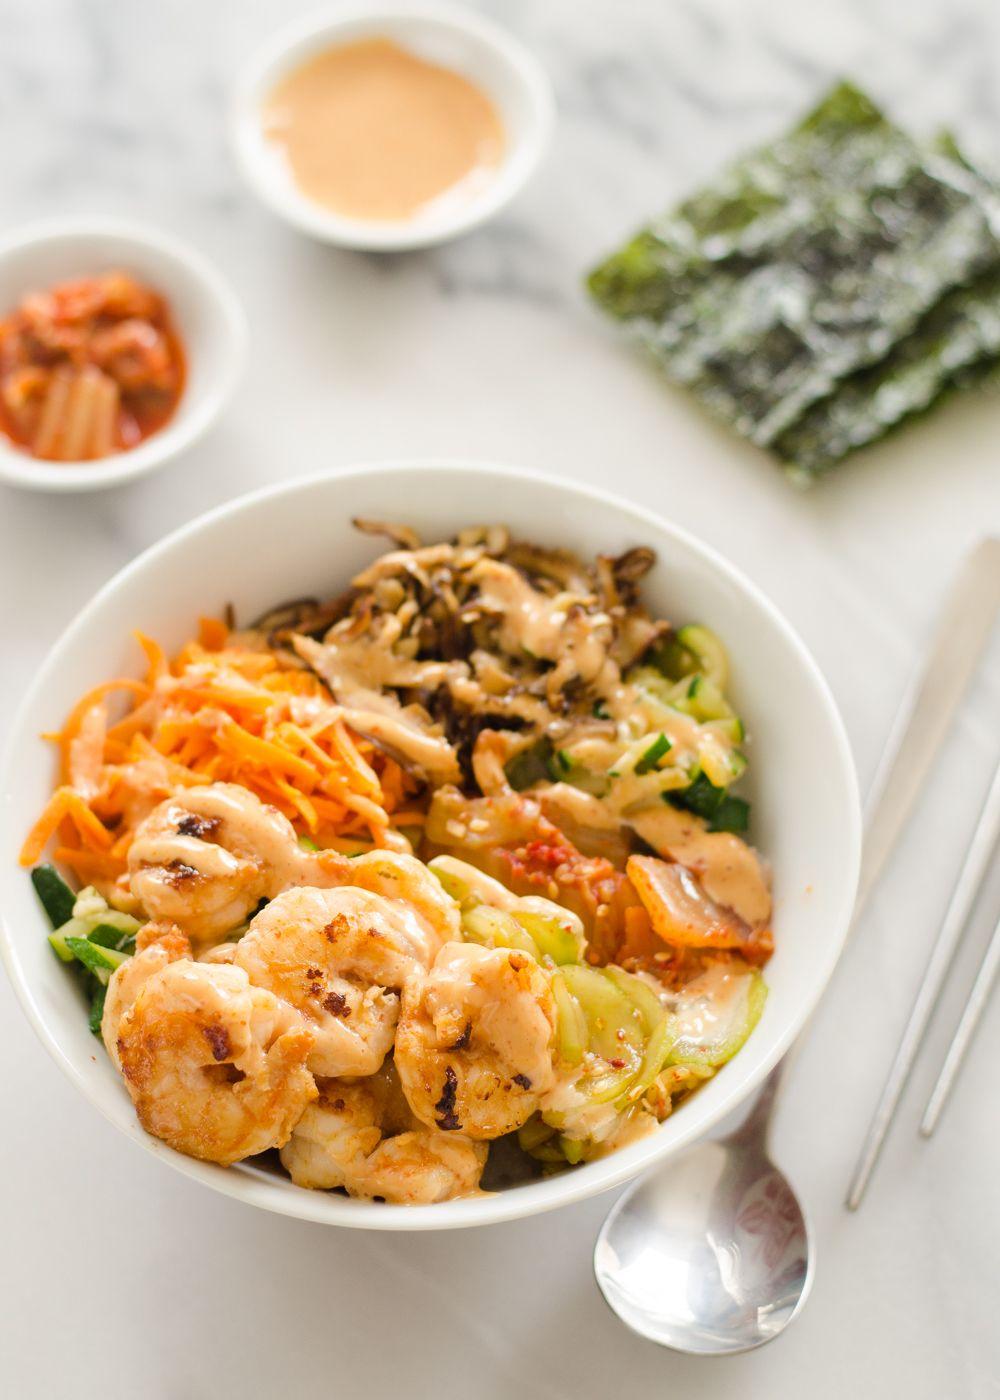 Spicy Korean Shrimp Rice Bowls Recipe Dinner, Shrimp